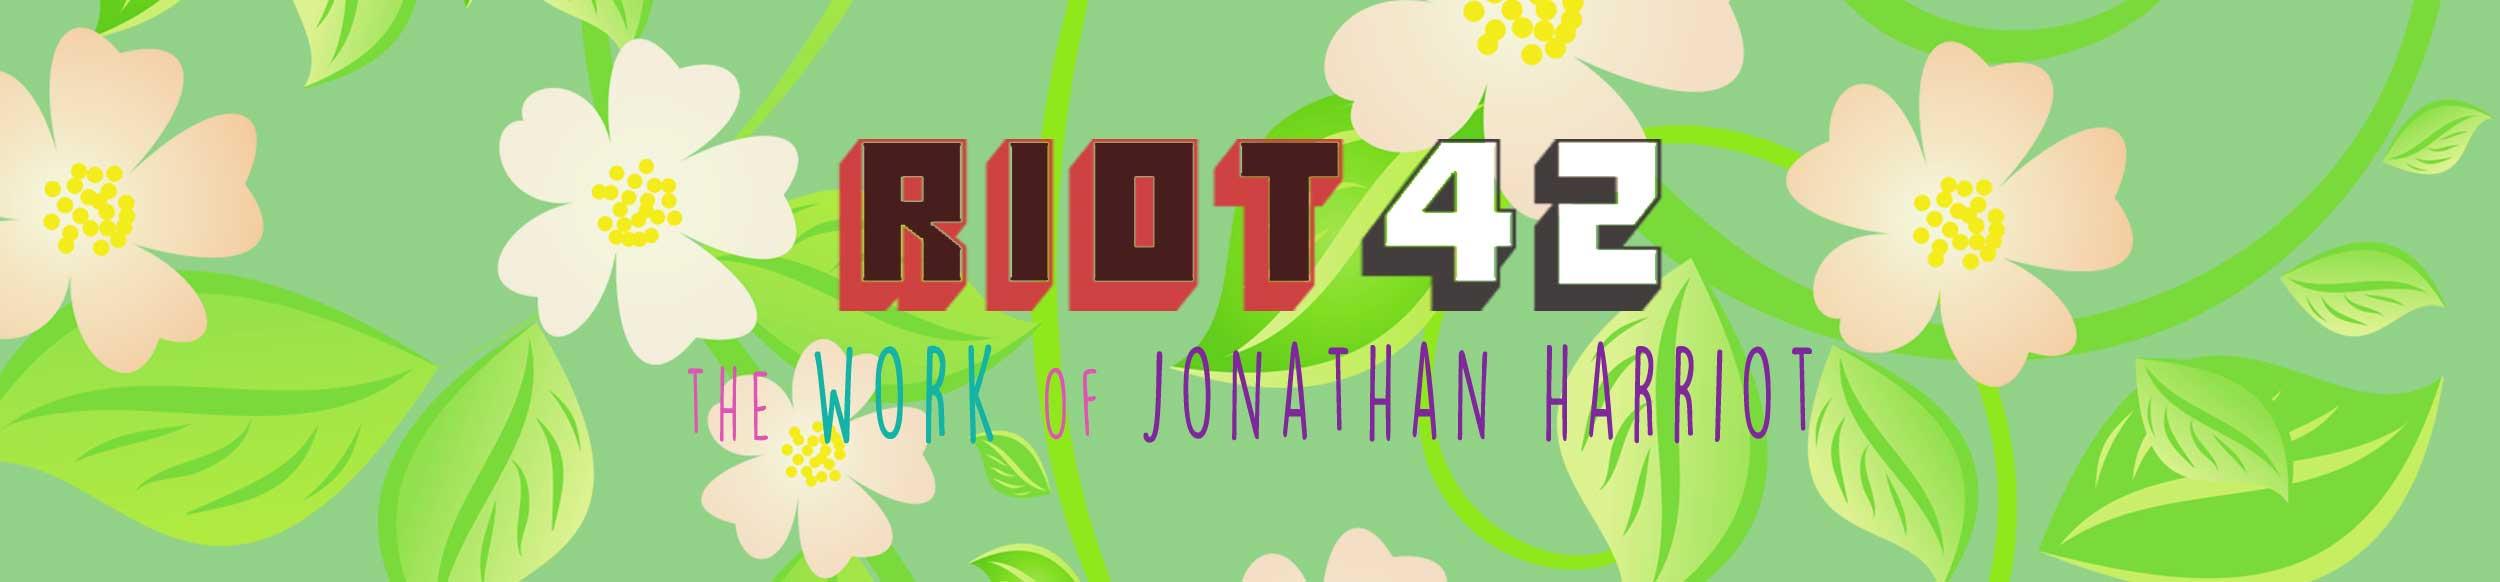 Jonathan Harriot